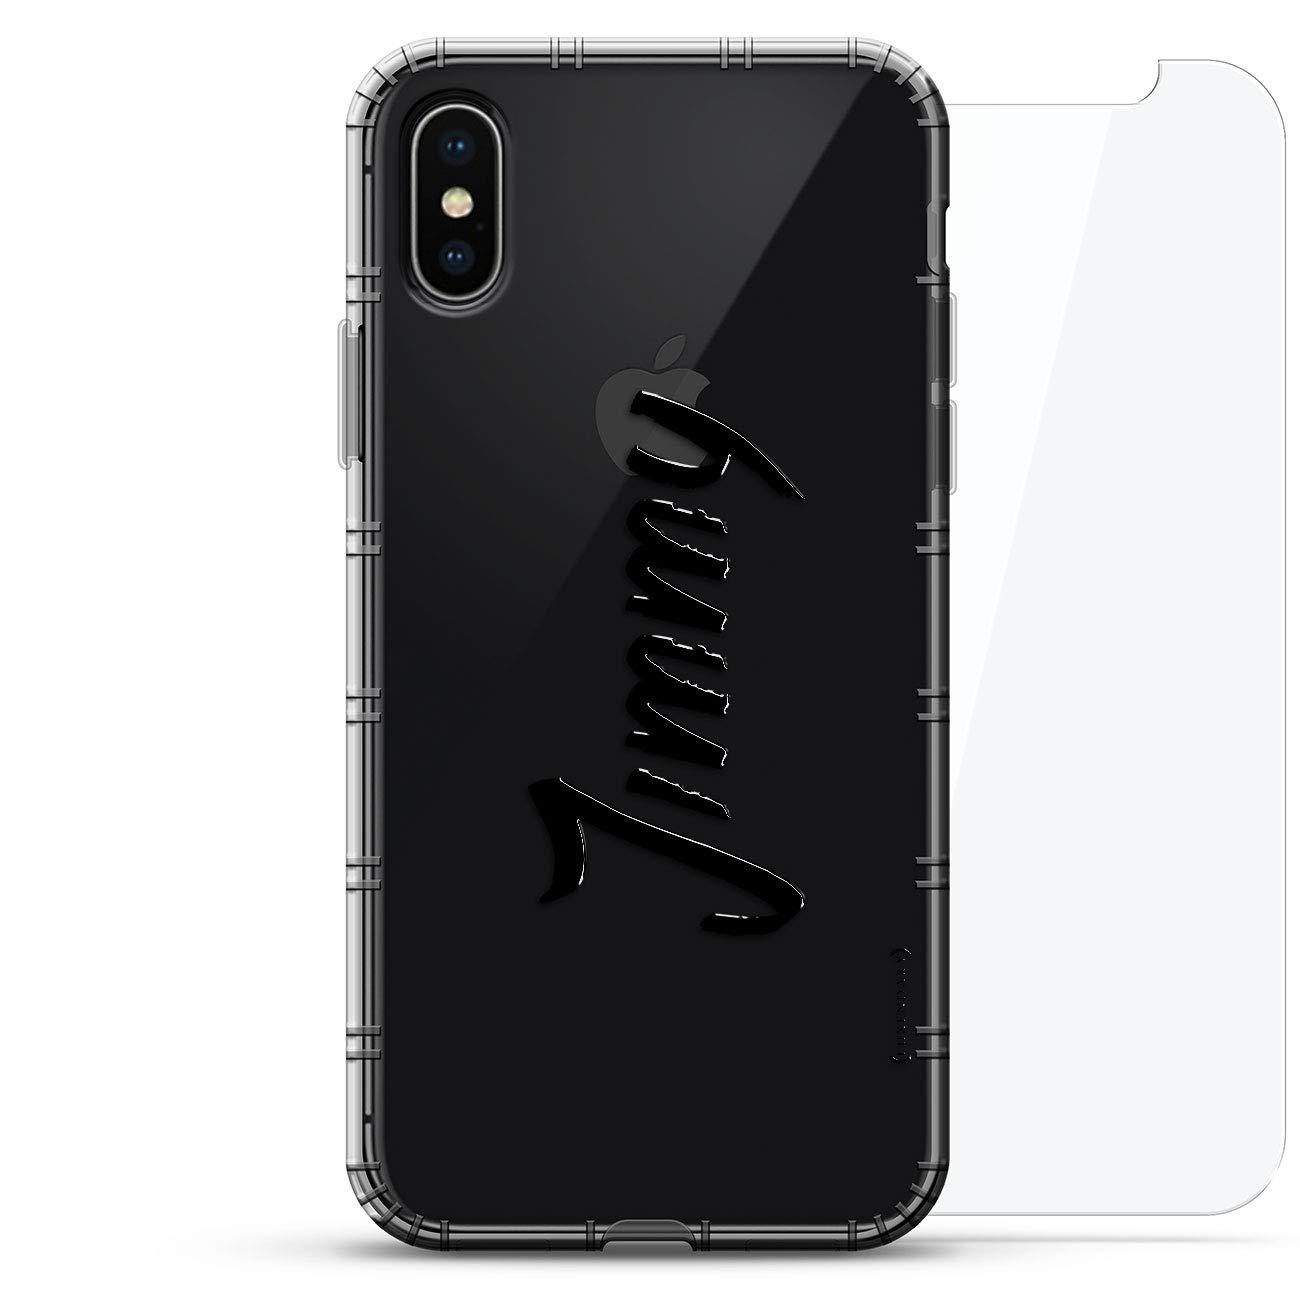 Amazon.com: Nombre: Jimmy, estilo escrito a mano, lujosa ...